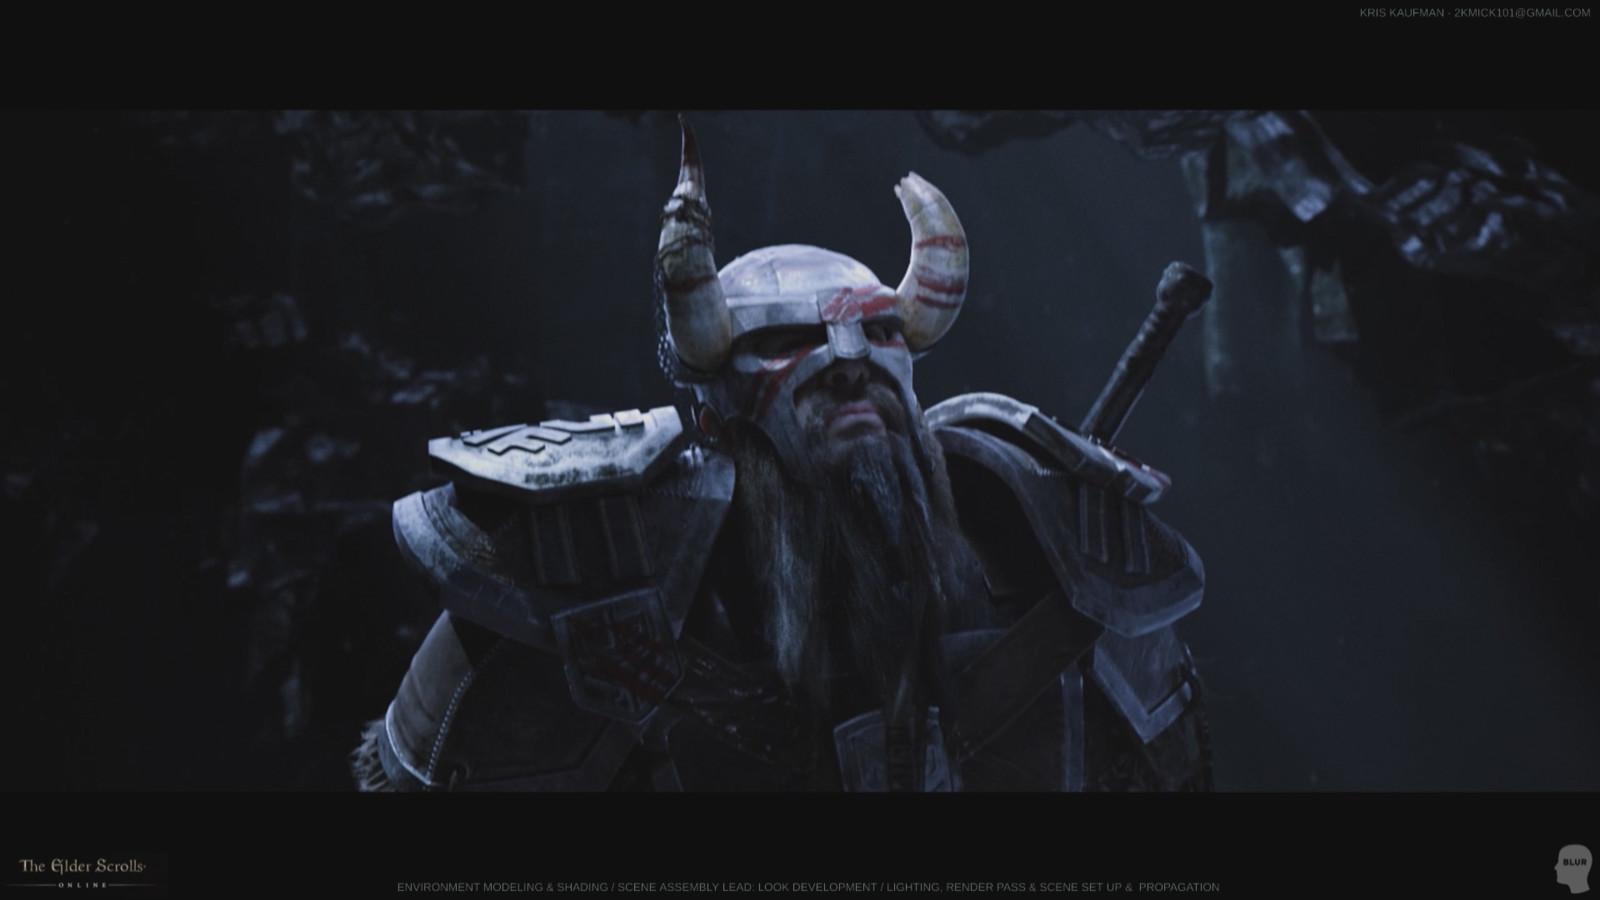 The Elder Scrolls Online: Look Development / Environment Modeling & Shading / Lighting / Rendering / Compositing